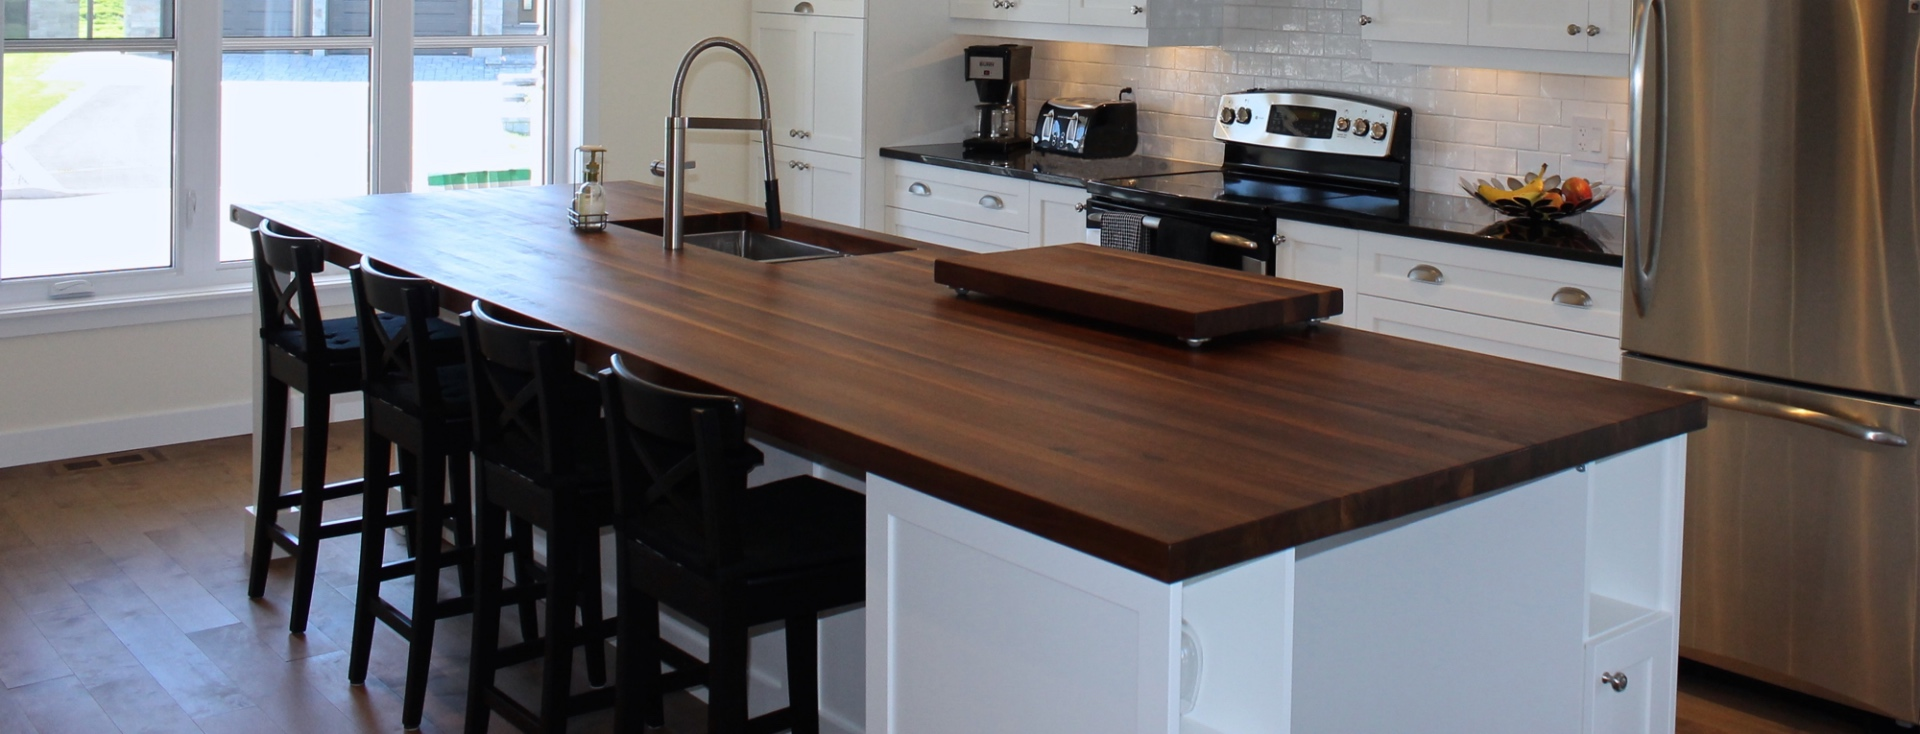 fabrication ilot central perfect ilt central with fabrication ilot central top good. Black Bedroom Furniture Sets. Home Design Ideas